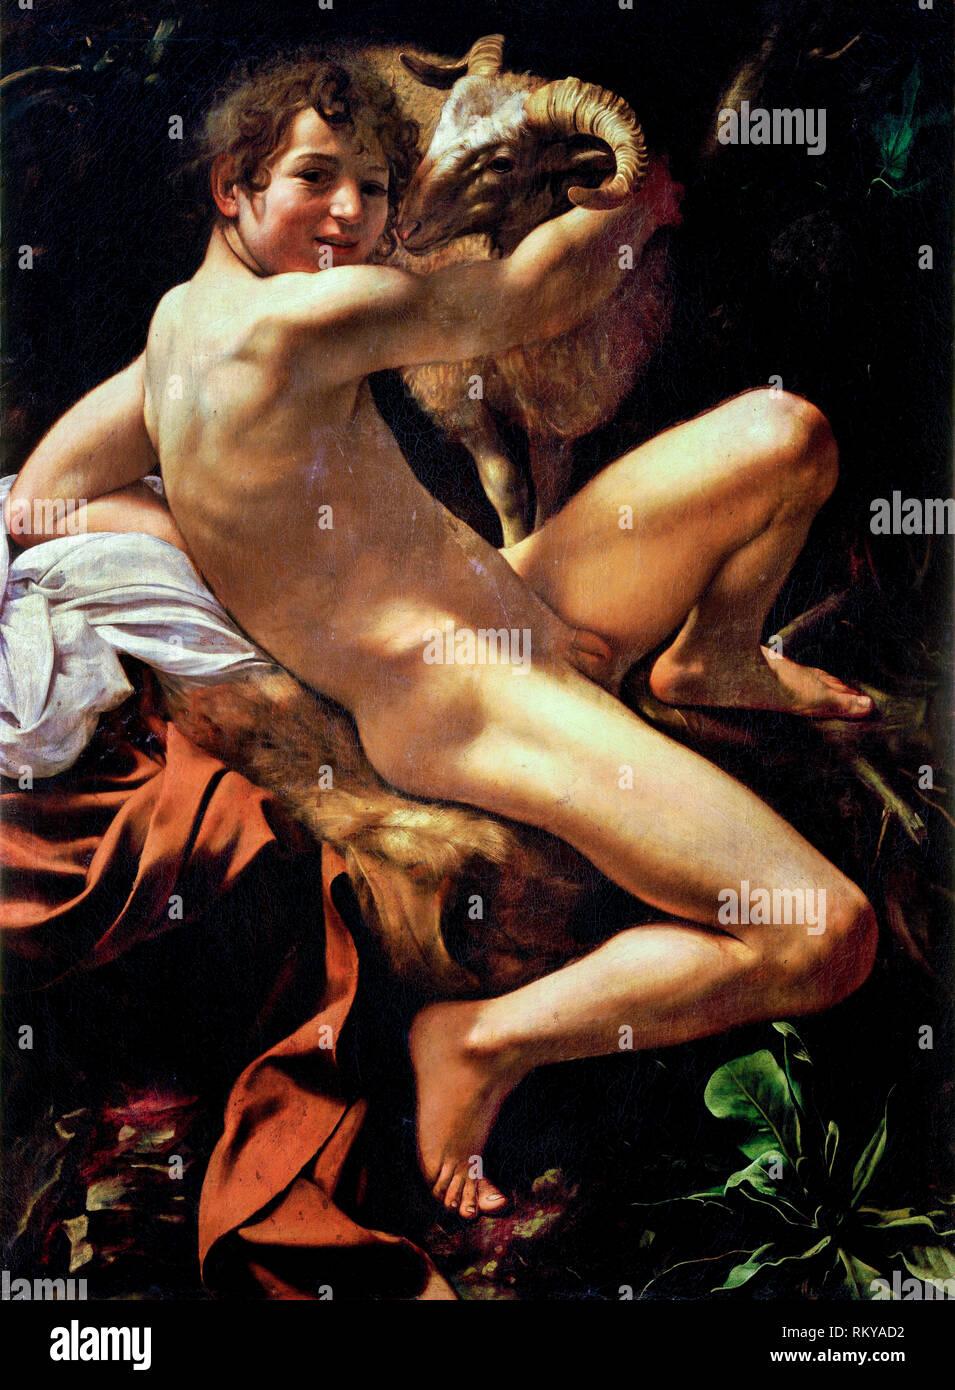 John the Baptist, Caravaggio, 1602, painting - Stock Image